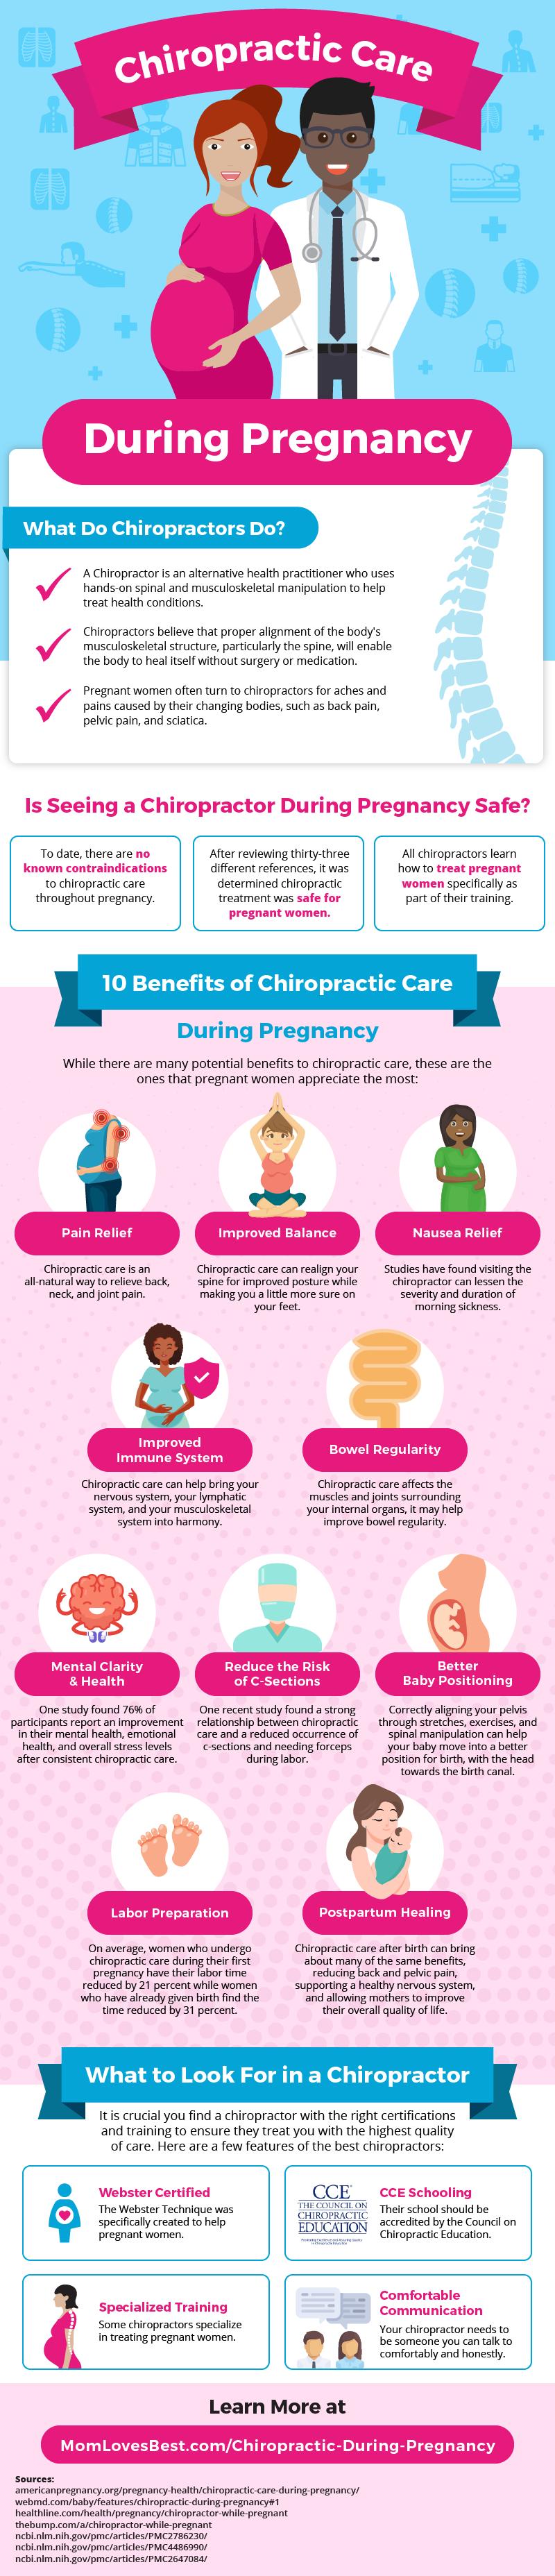 10 Benefits of Chiropractic During Pregnancy - Dr. Ryan Hamm